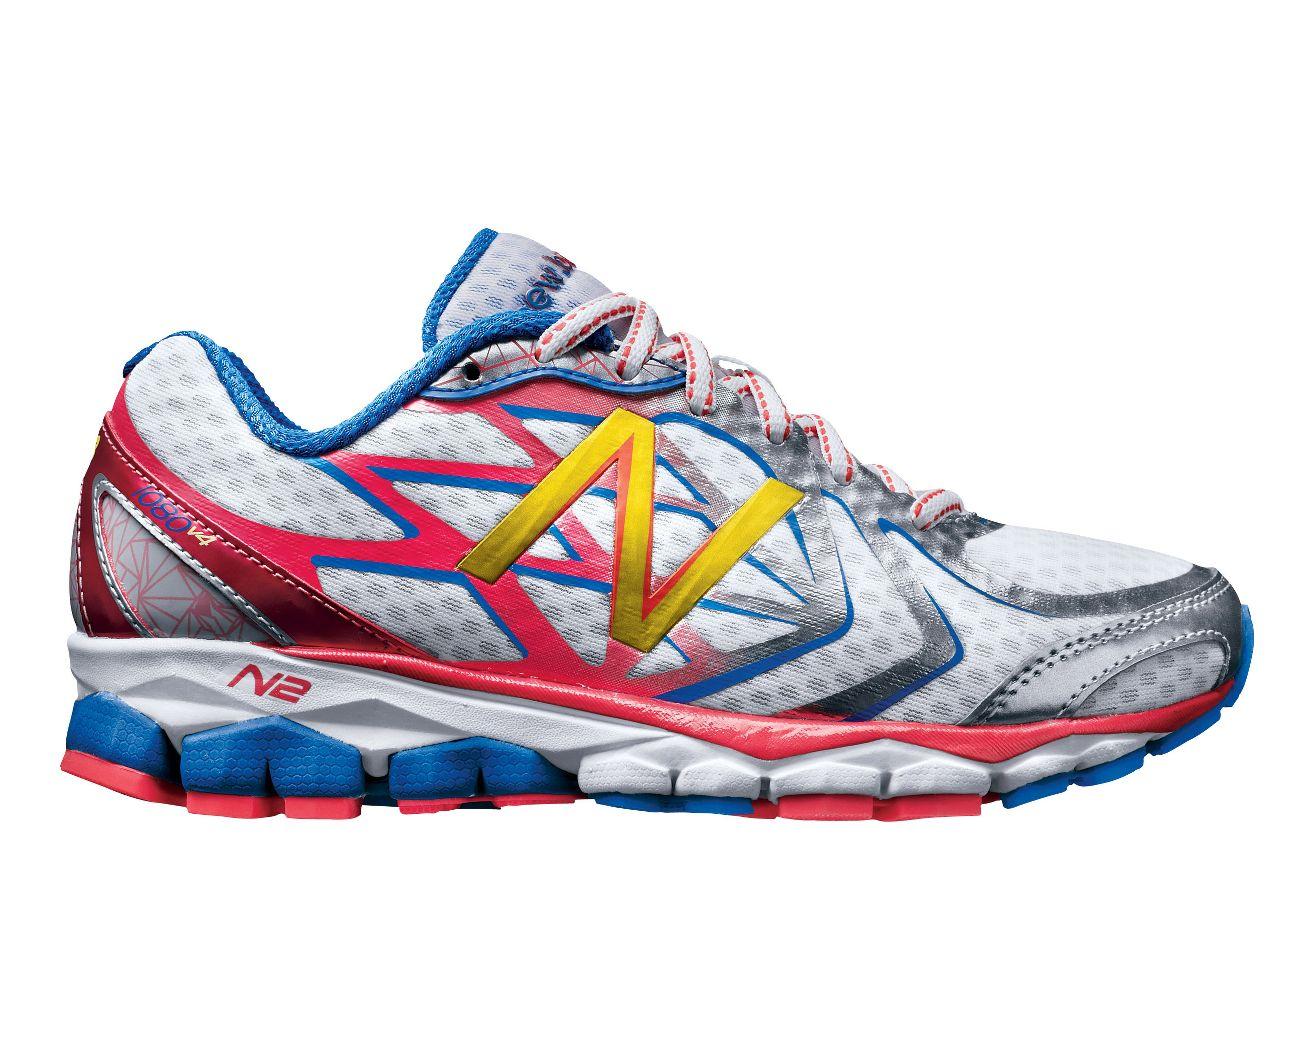 New Balance 1080V4 New Balance- White running shoes